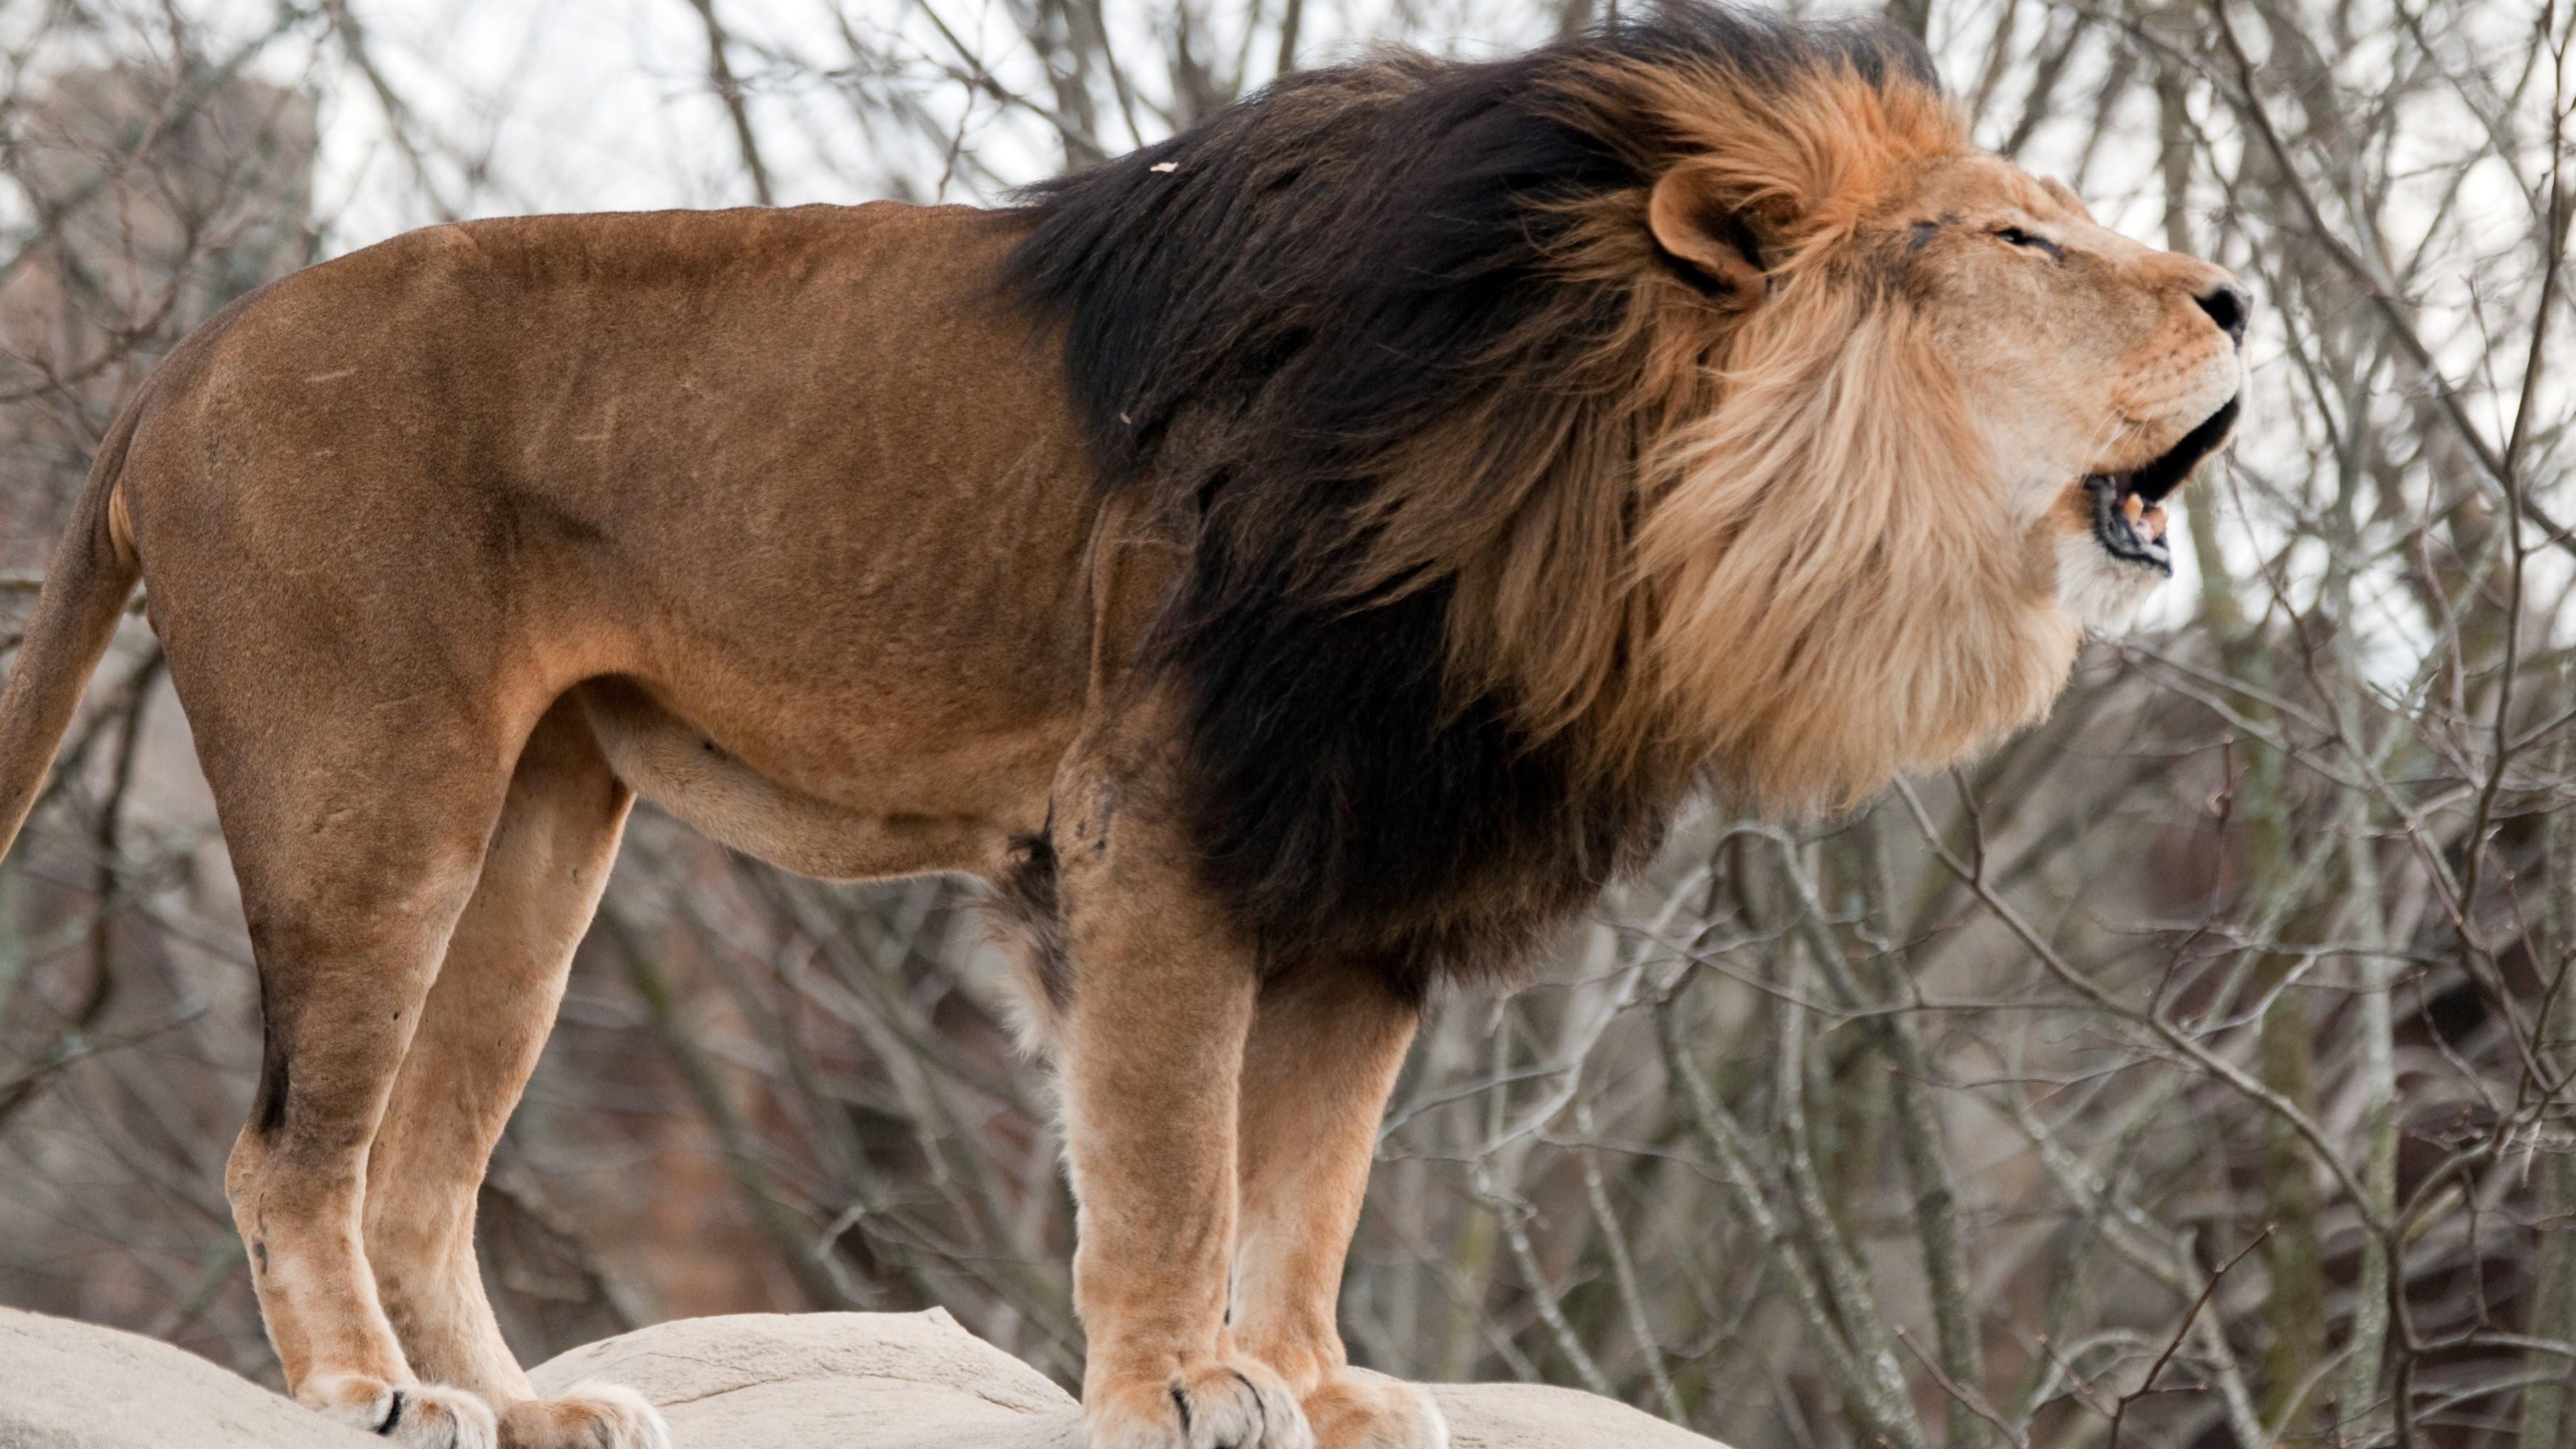 Roaring Lion Wallpaper (67+ Images